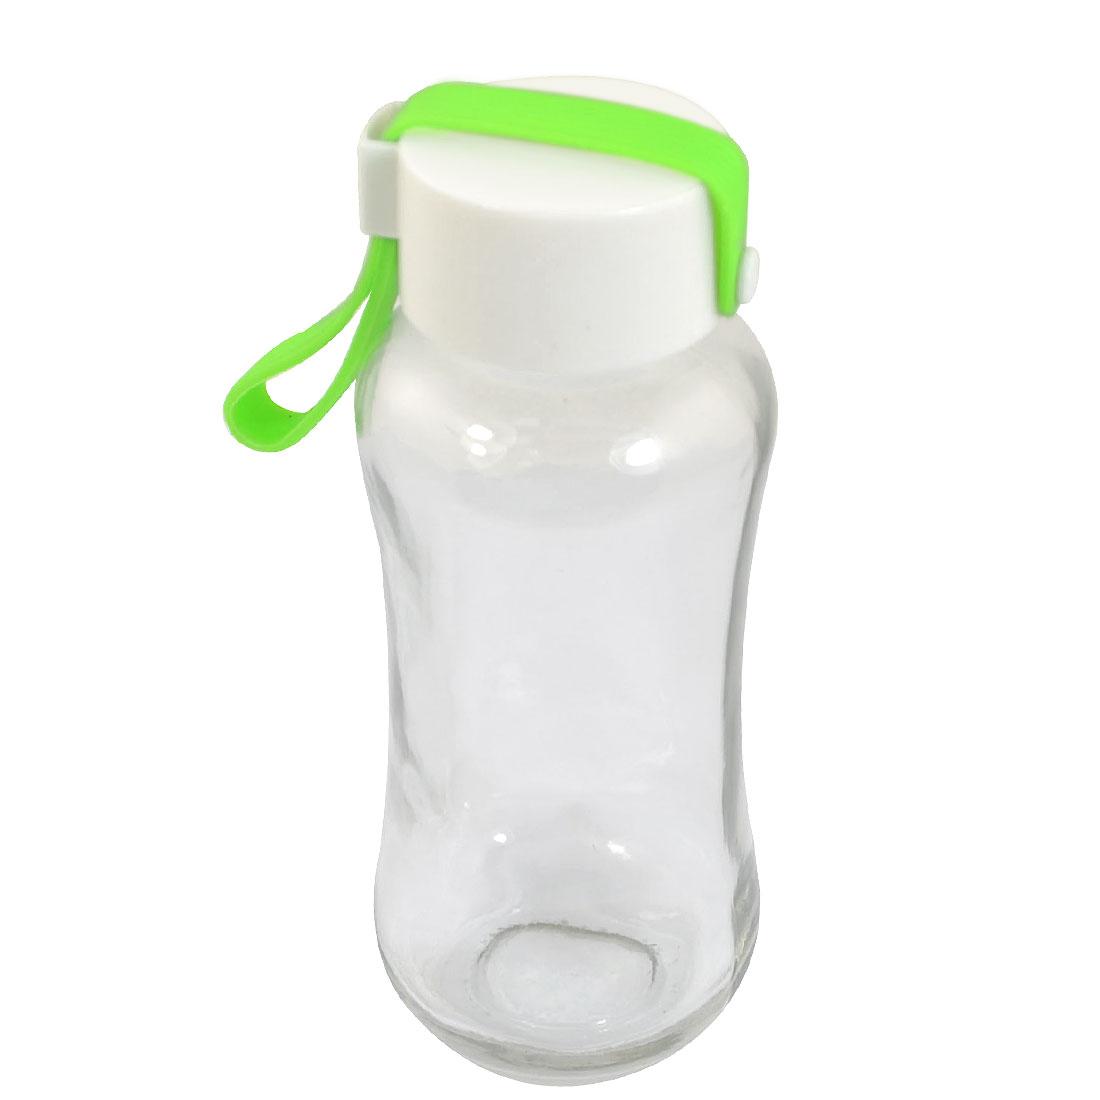 Travel Green Nylon Protect Sleeve Shatterproof Glass Water Bottle Cup Mug 250ML